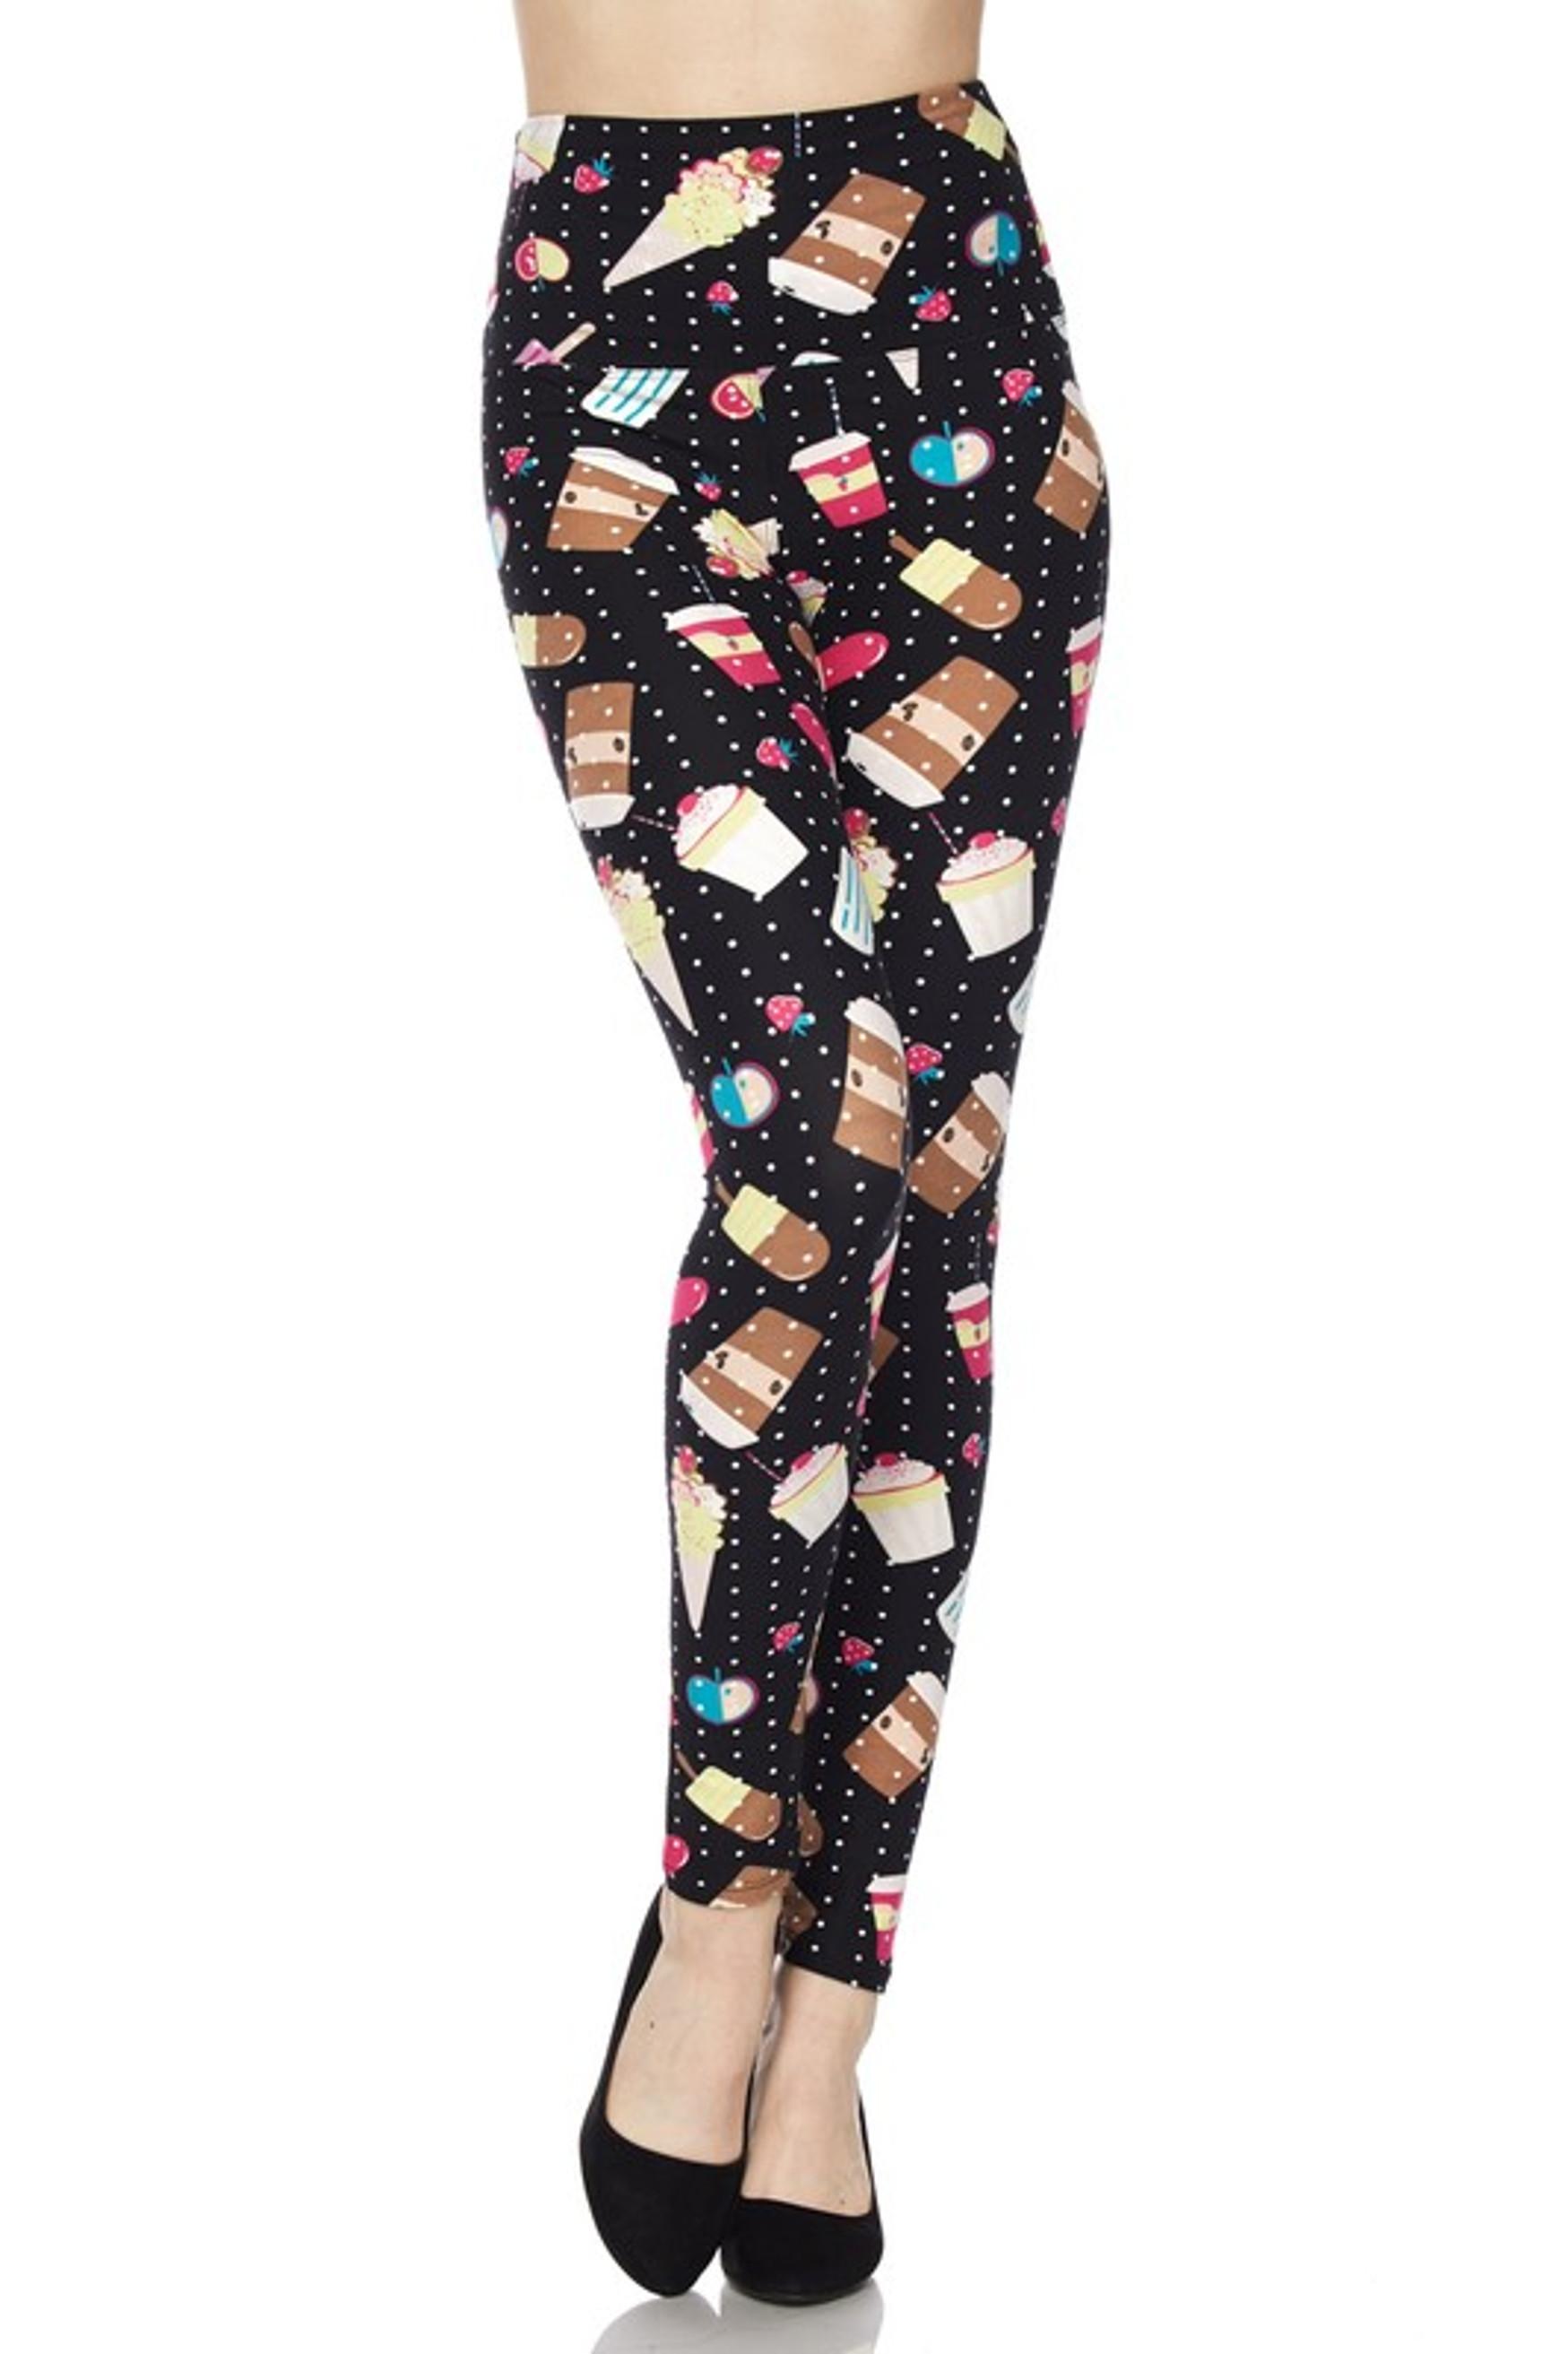 Summer Treats High Waisted Leggings - White Mini Dots